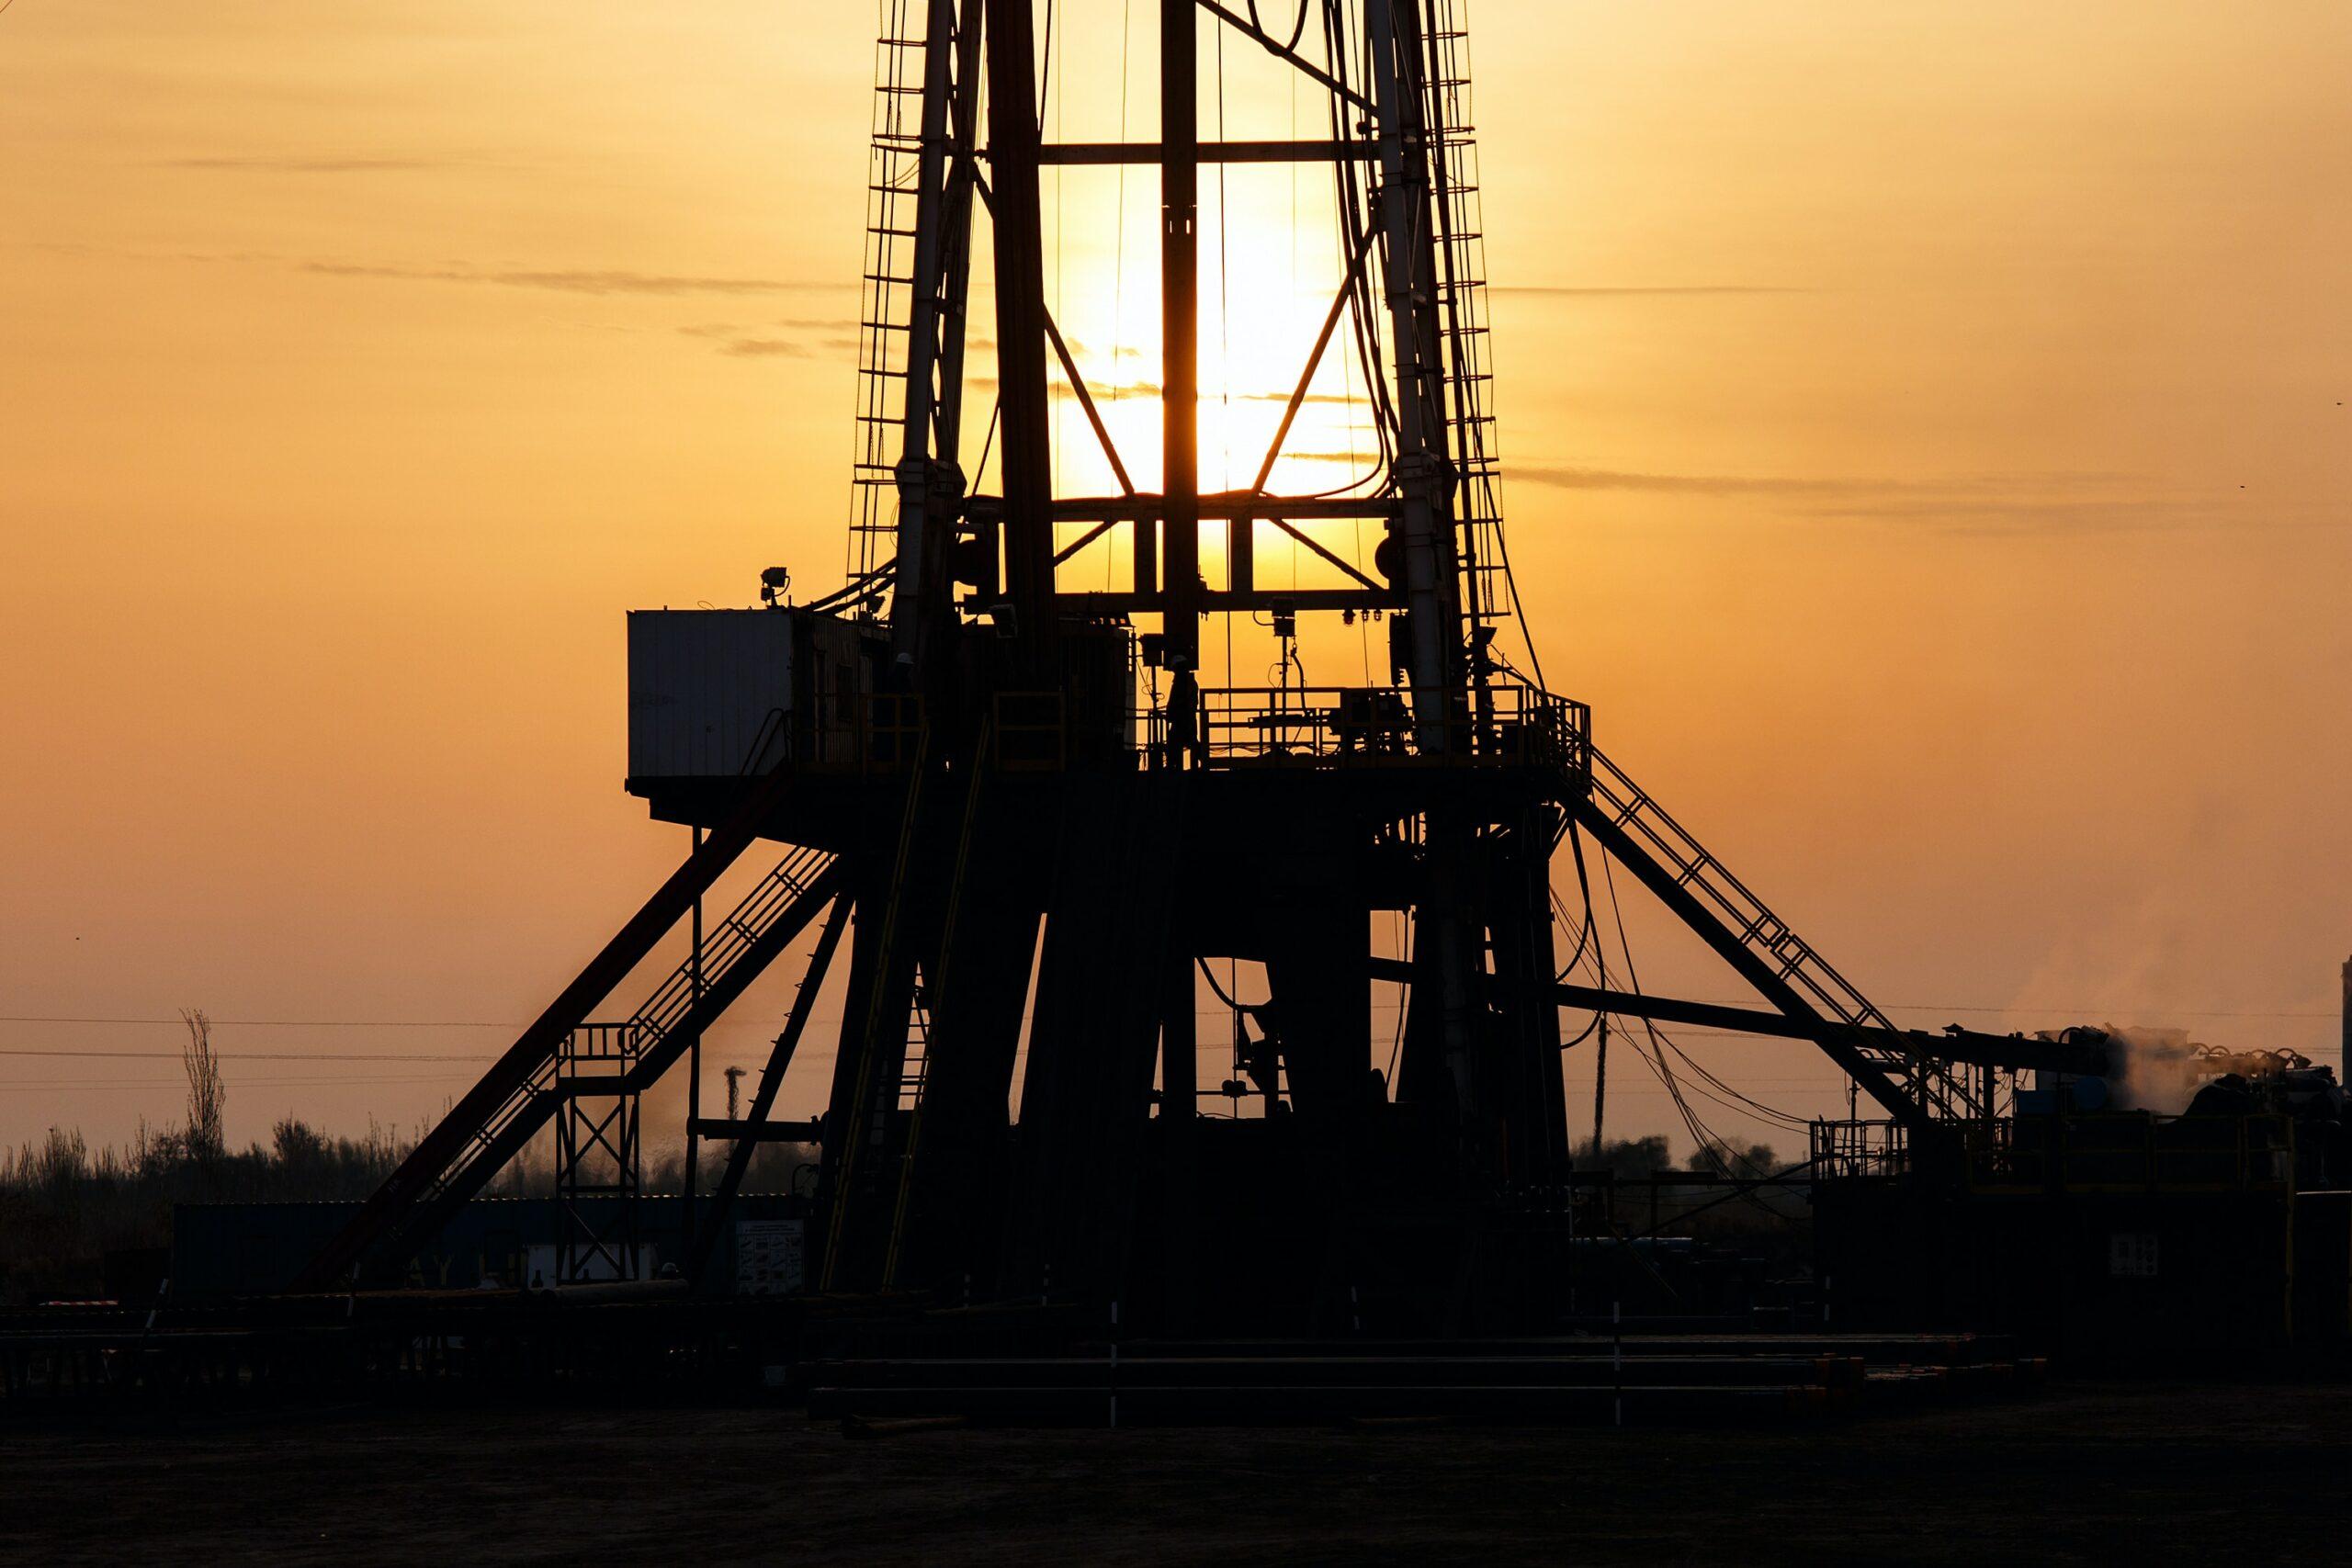 India's Bid to Privatize Major Oil CompanyGets Lukewarm Response